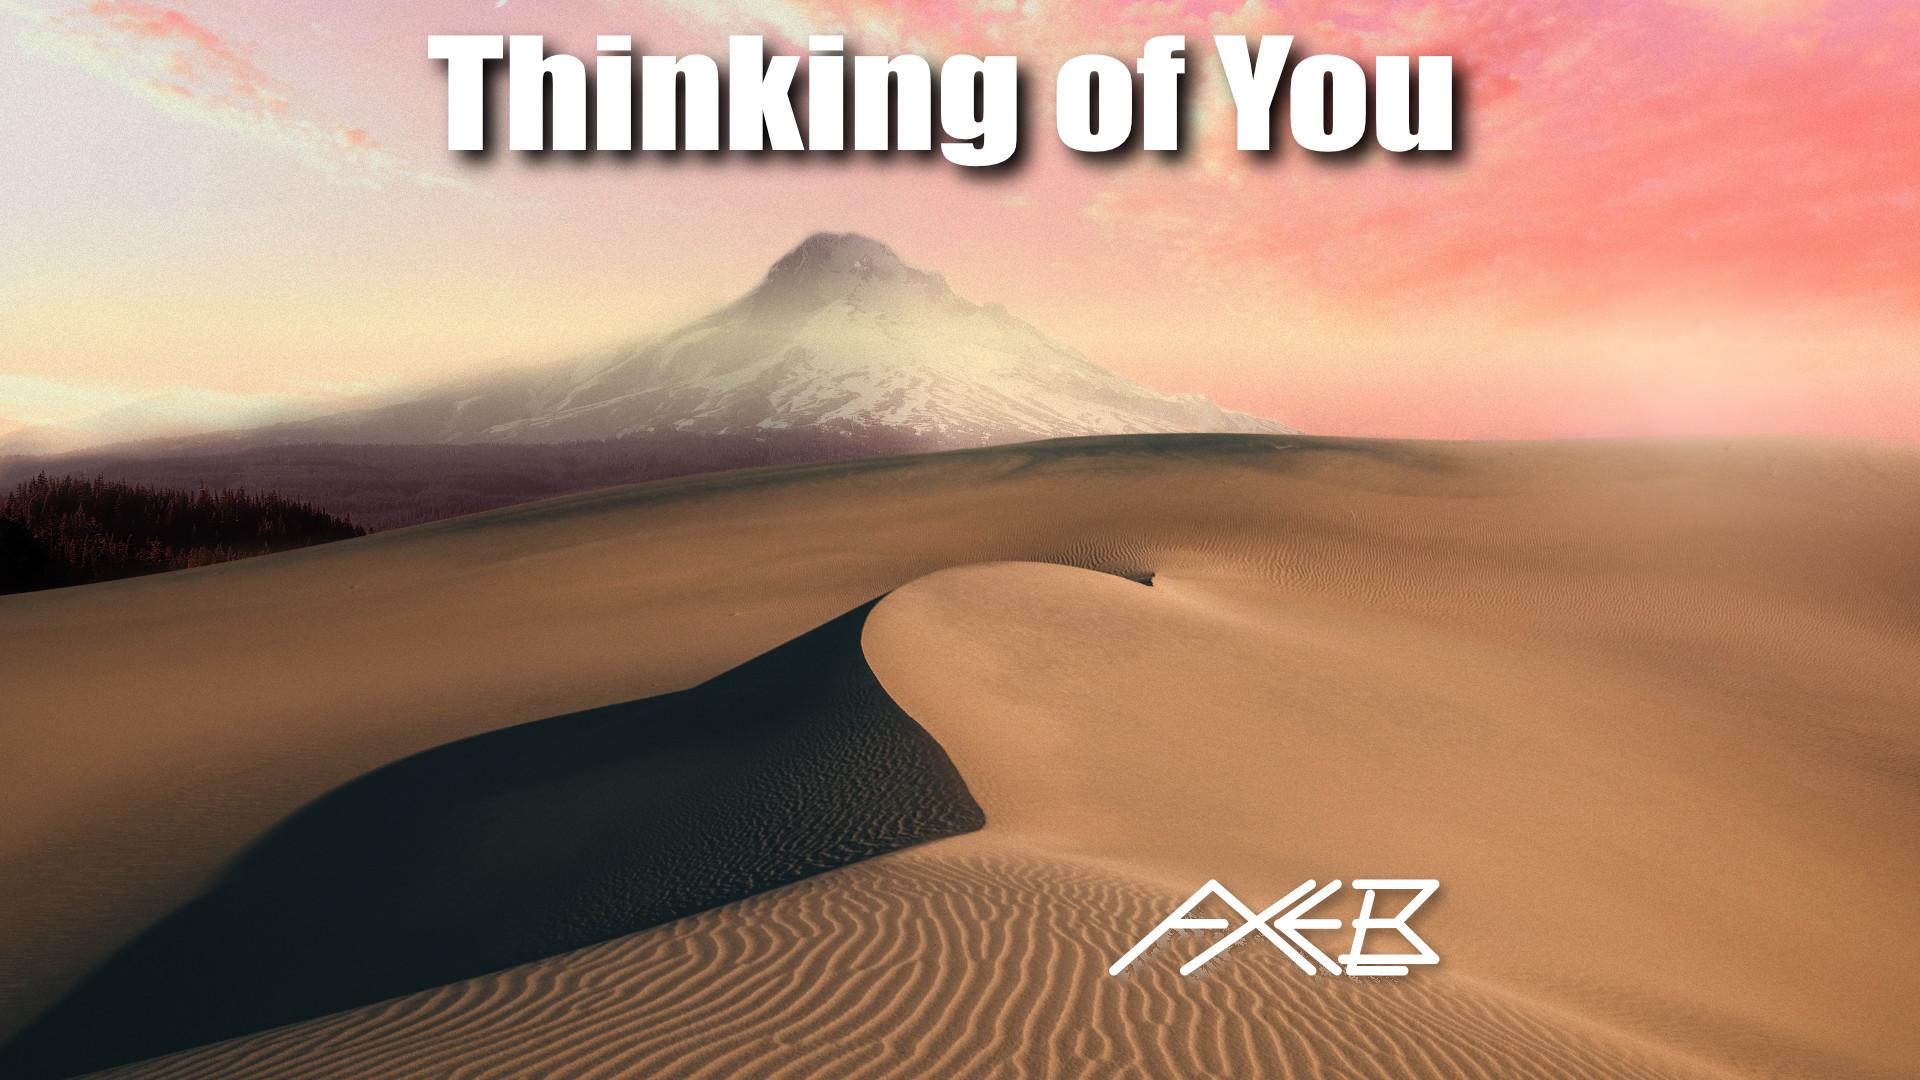 Thinking of you_1080p.jpg